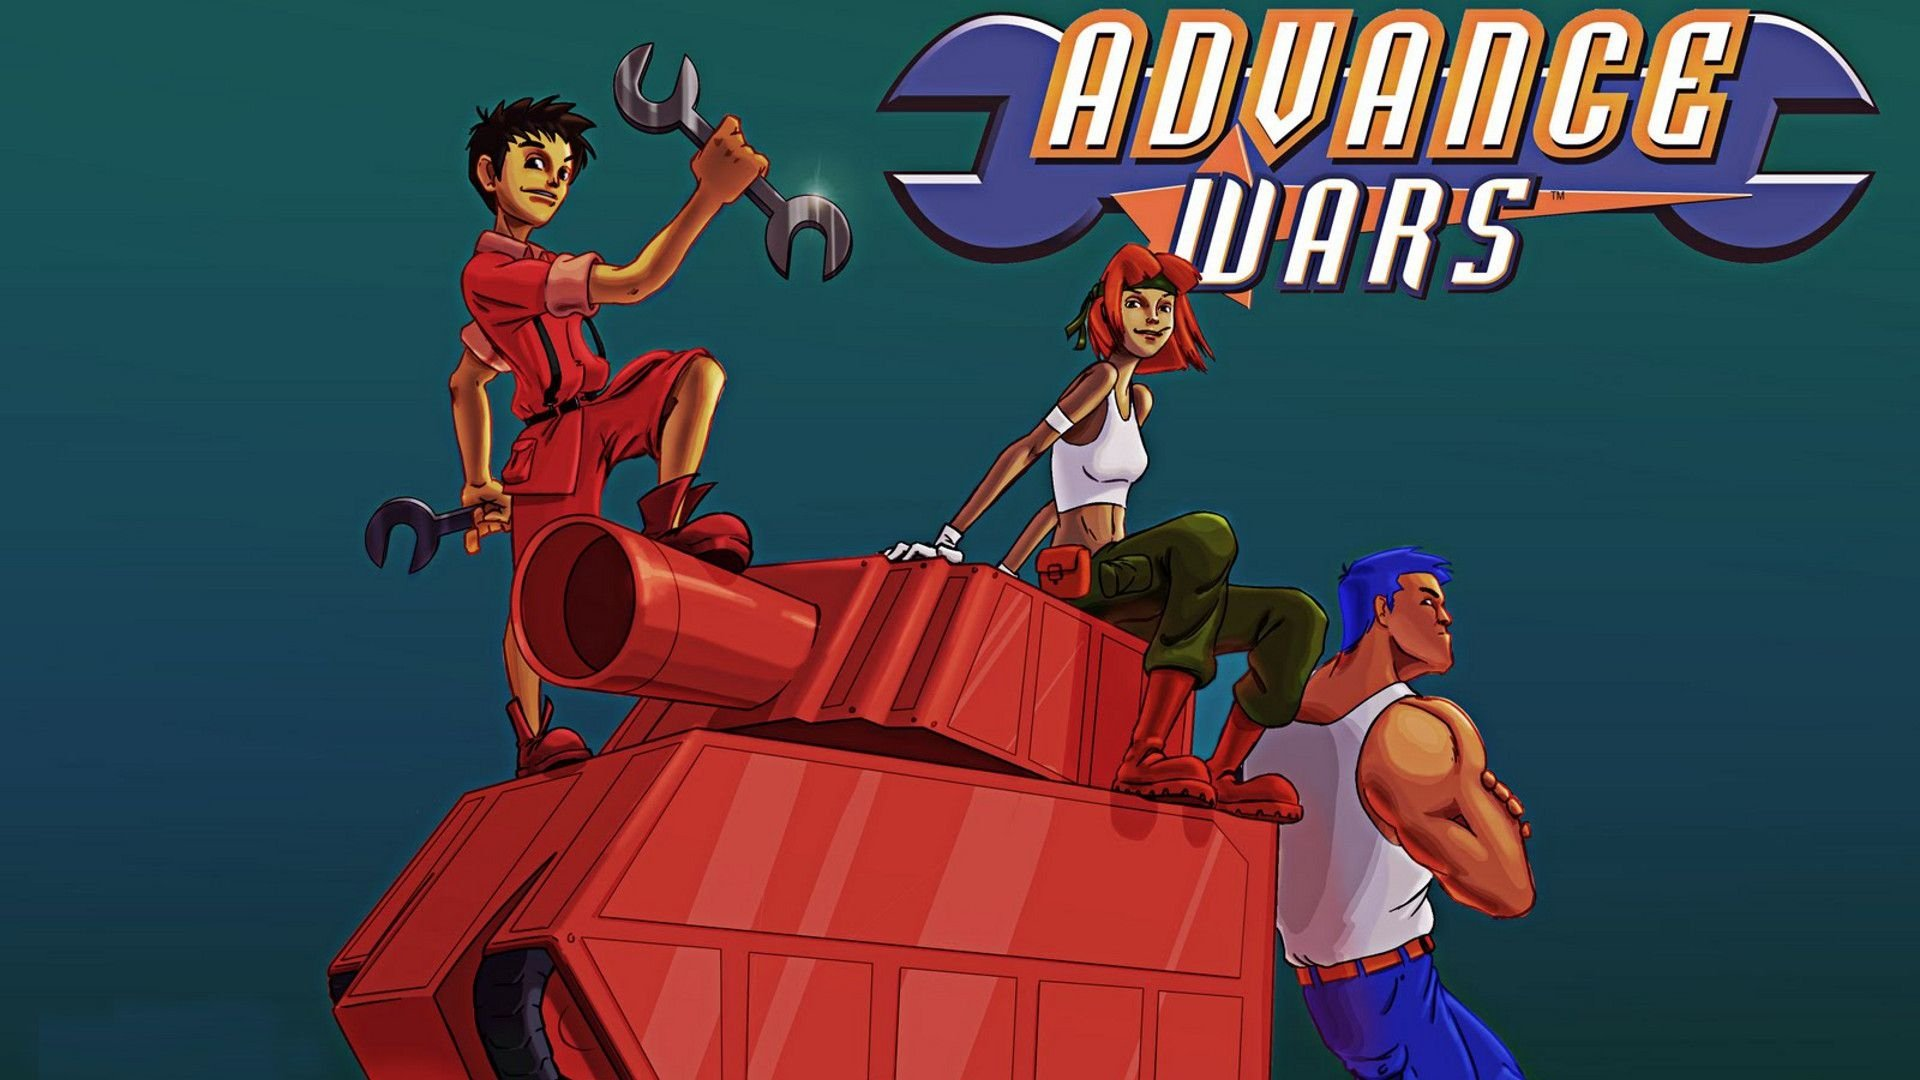 Advance Wars Hd Wallpaper Background Image 1920x1080 Id